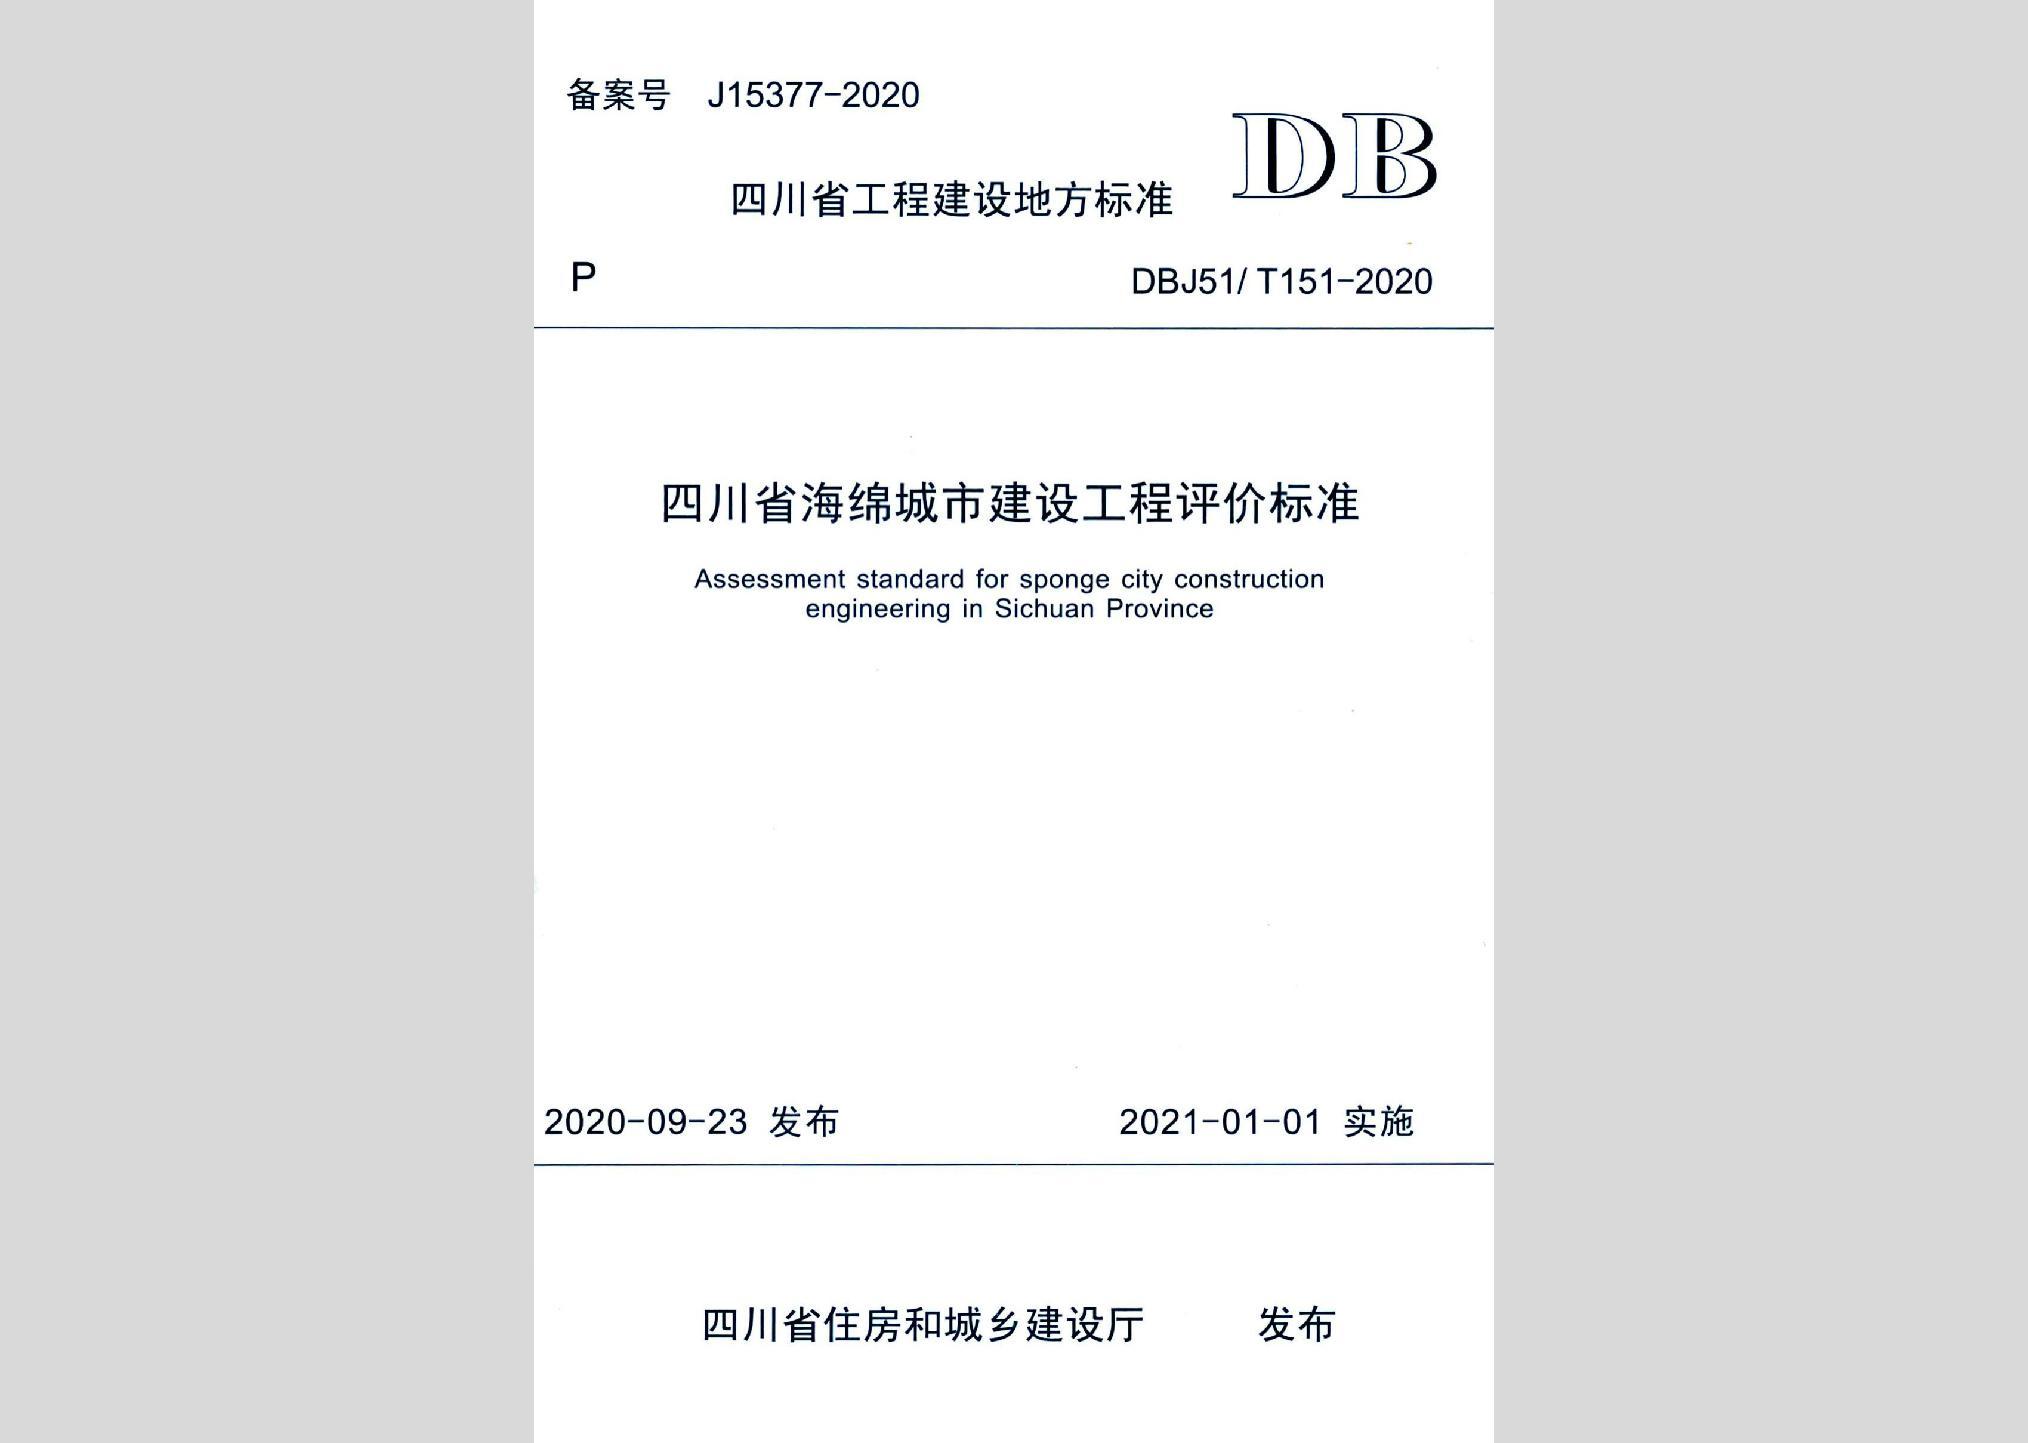 DBJ51/T151-2020:四川省海绵城市建设工程评价标准